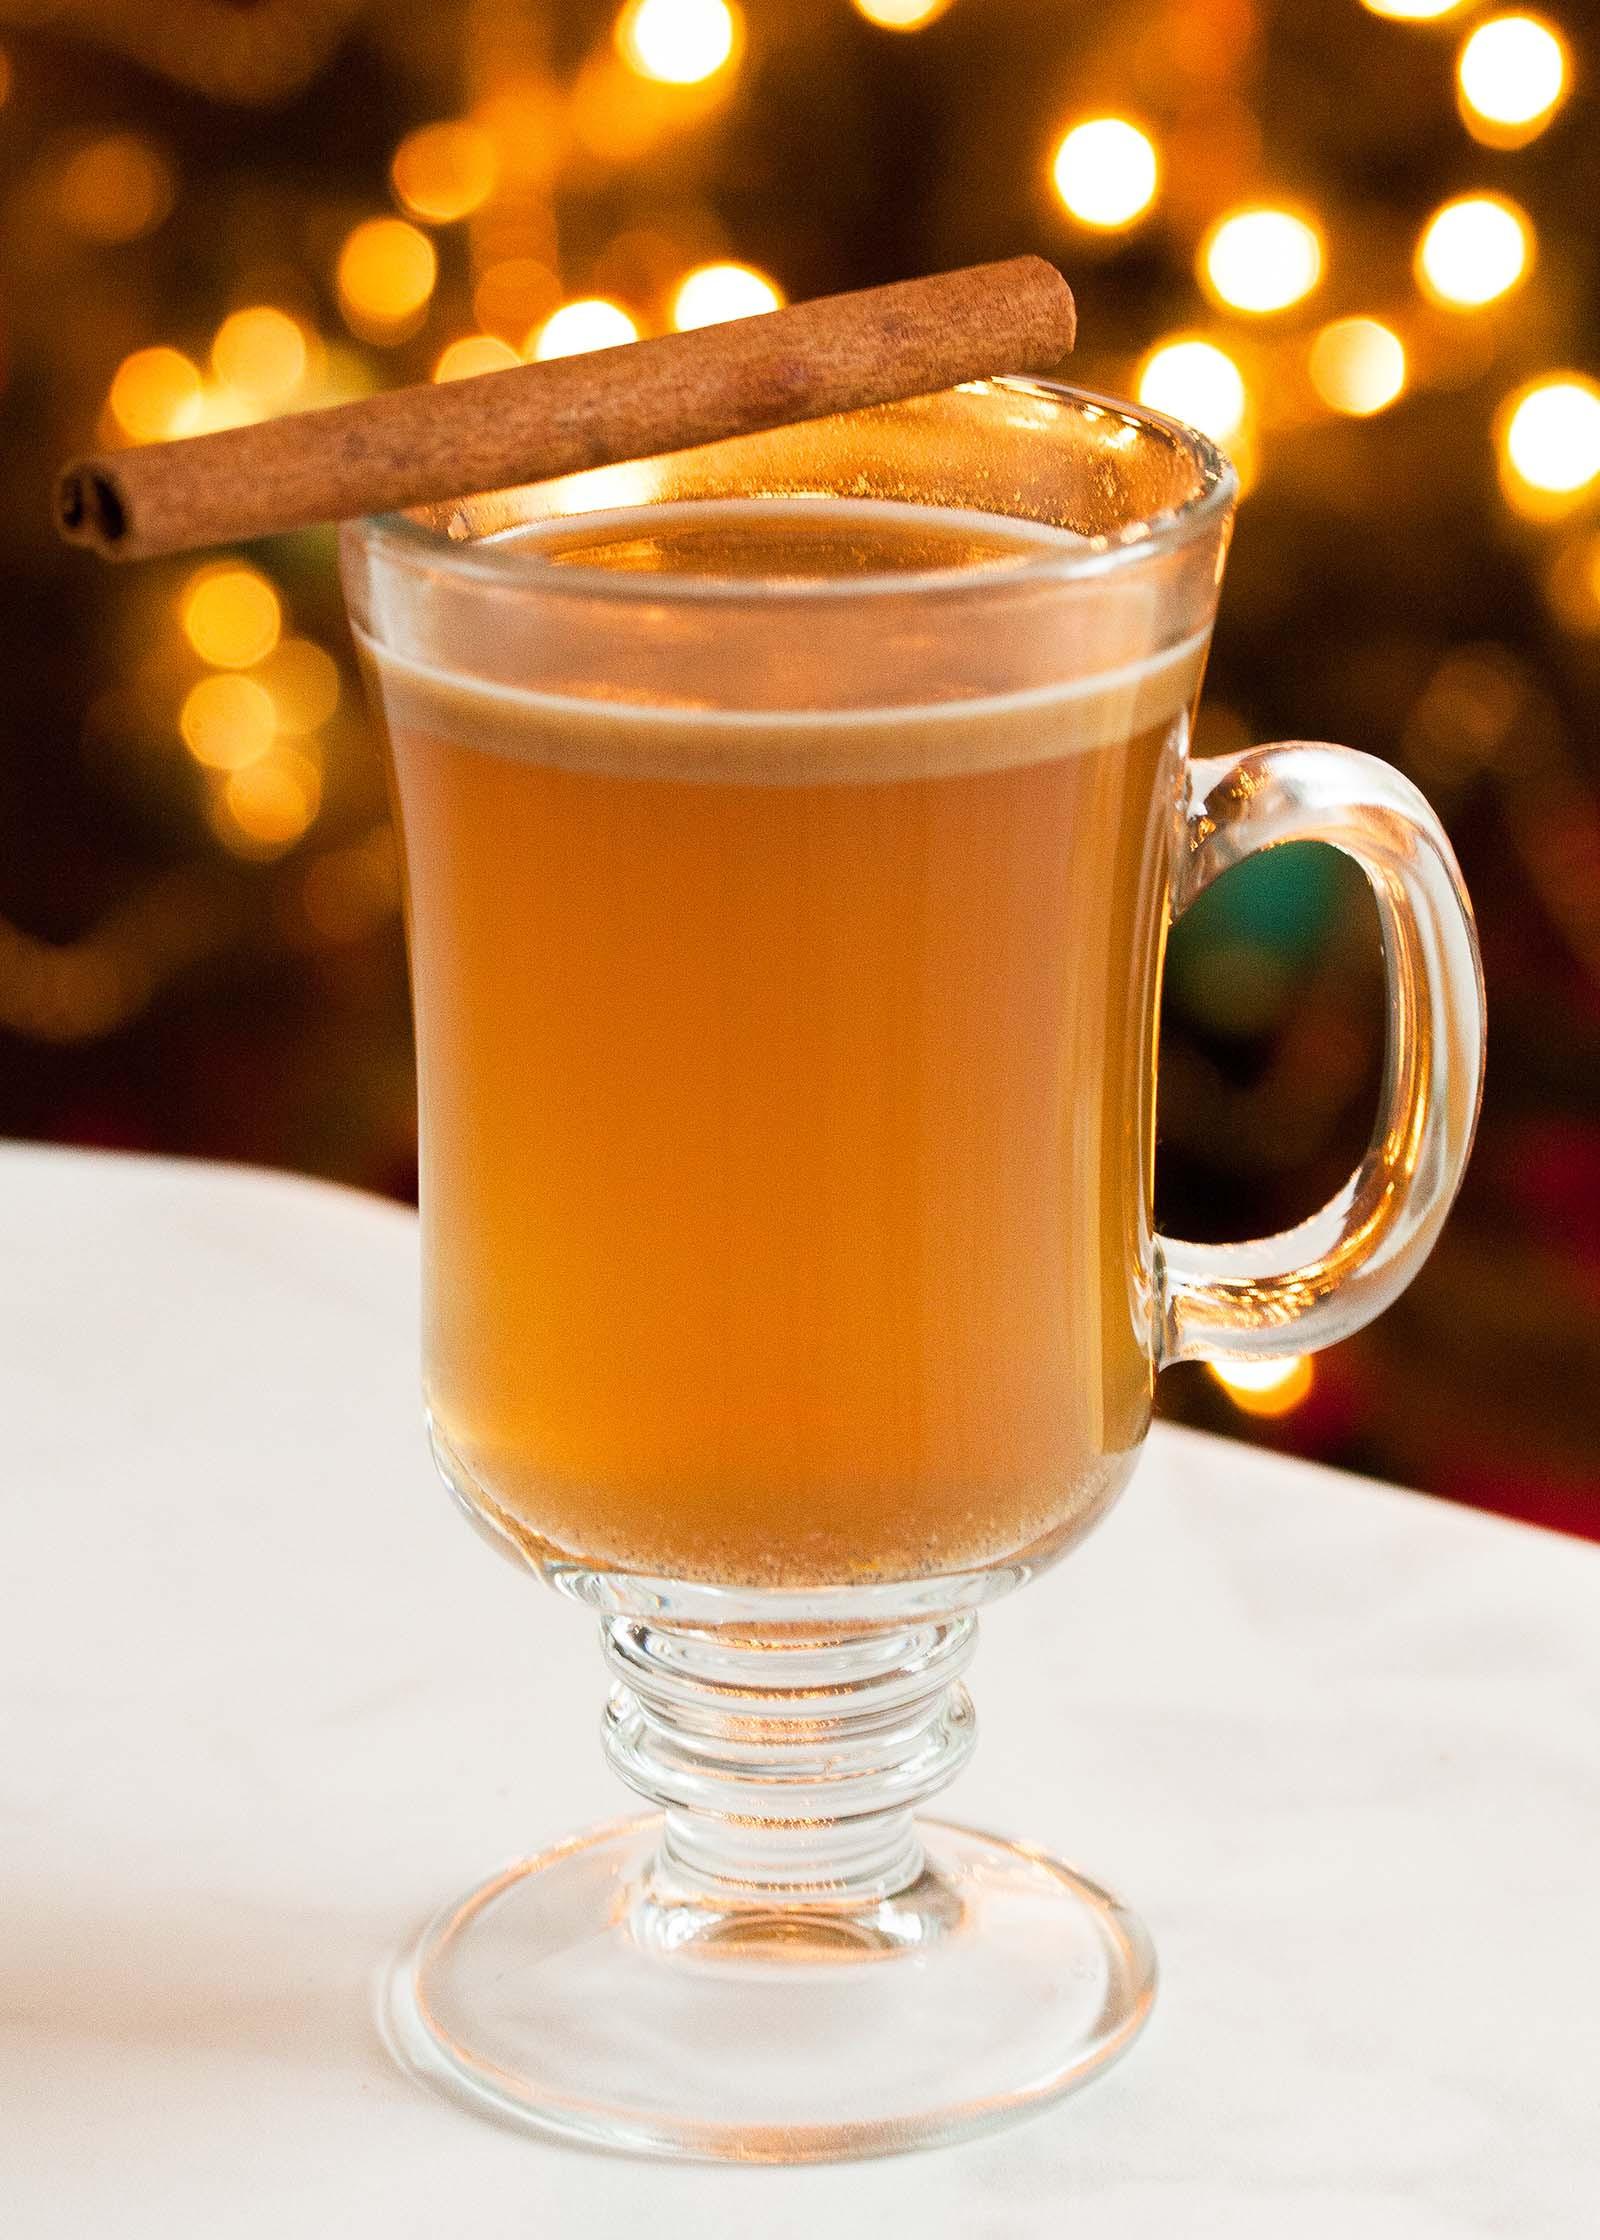 Warm Rum Drinks  Orange & Vanilla Hot Buttered Rum Recipe